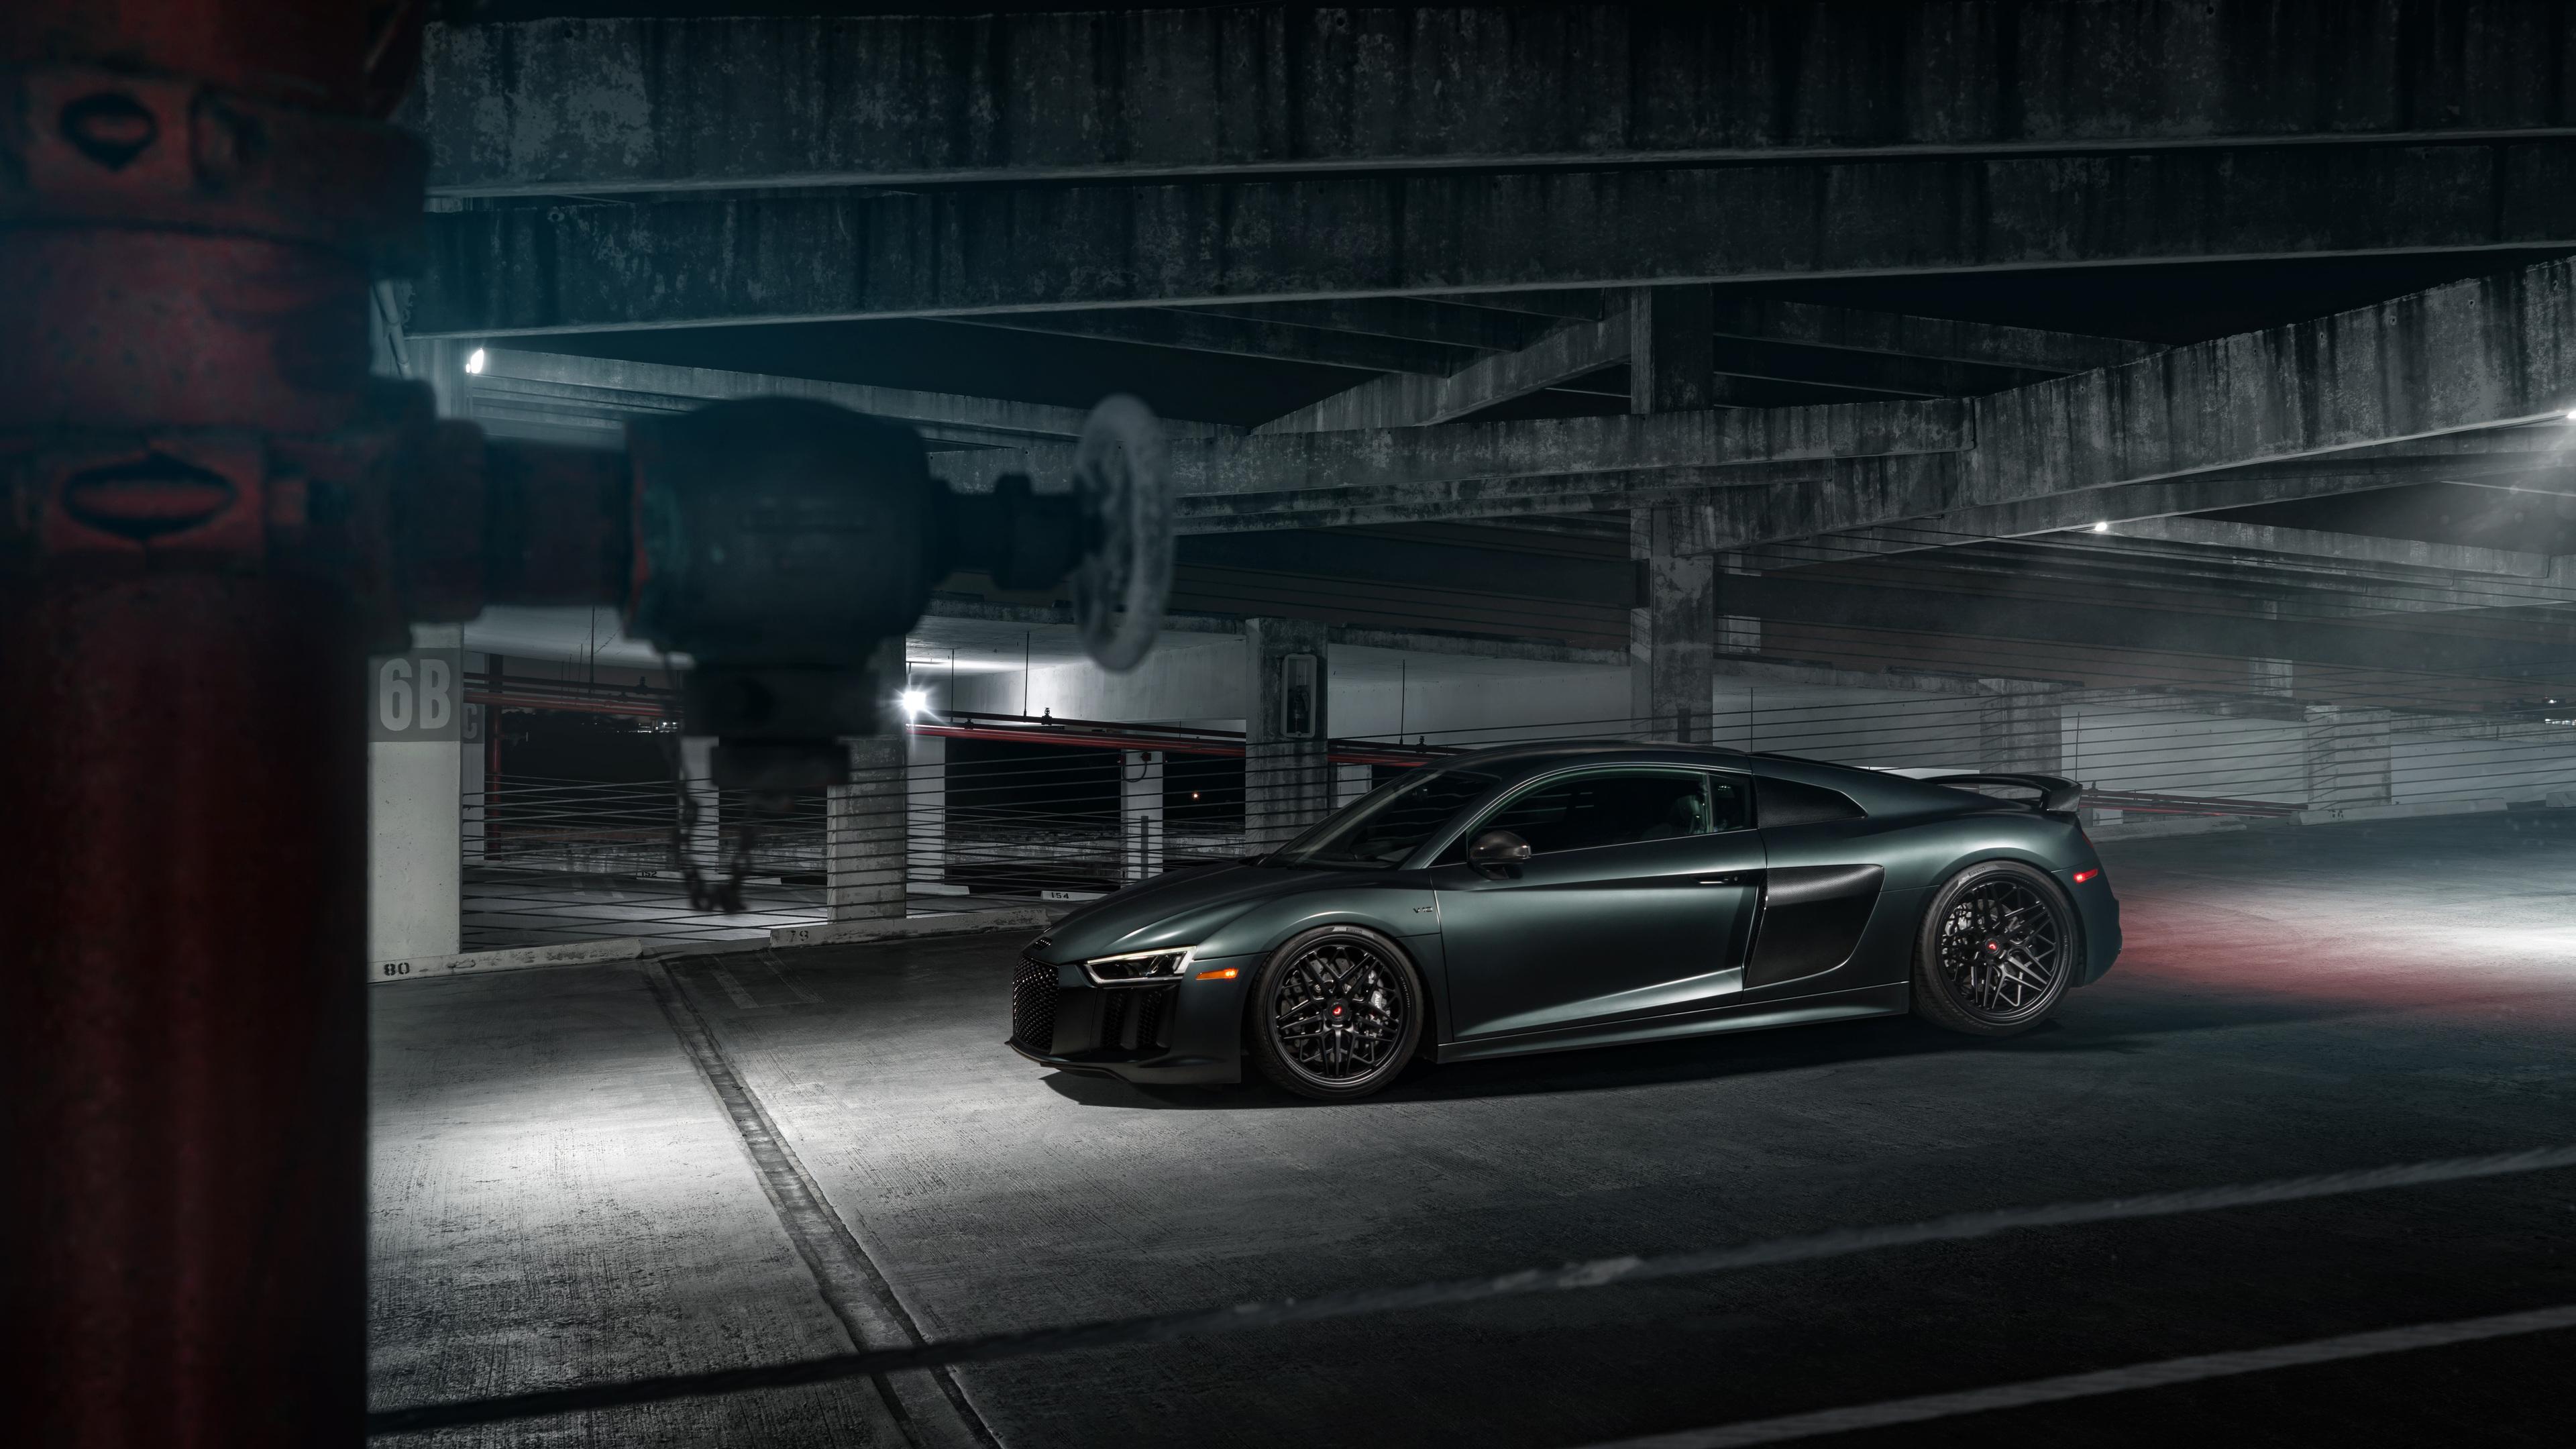 vossen green audi r8 4k 1554245199 - Vossen Green Audi R8 4k - hd-wallpapers, cars wallpapers, audi wallpapers, audi r8 wallpapers, 8k wallpapers, 5k wallpapers, 4k-wallpapers, 2019 cars wallpapers